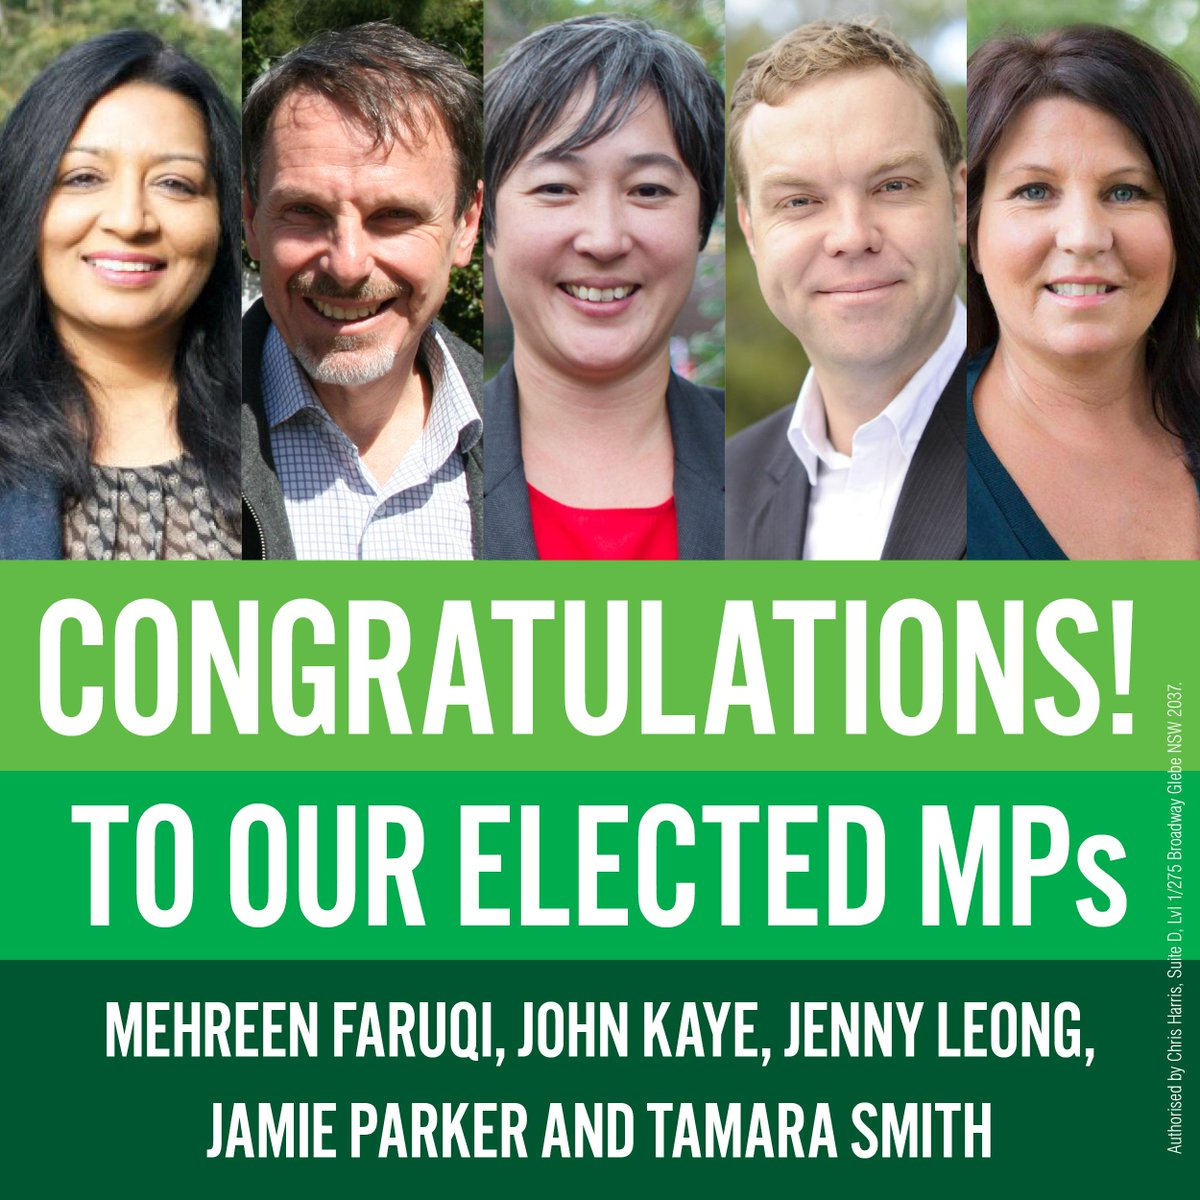 Congrats to @JennyLeong, @GreensJamieP, @GreensTamara, @JohnKGreens & @MehreenFaruqi! Too close to call 4 @GreenGuise http://t.co/Q2LiGMcusq